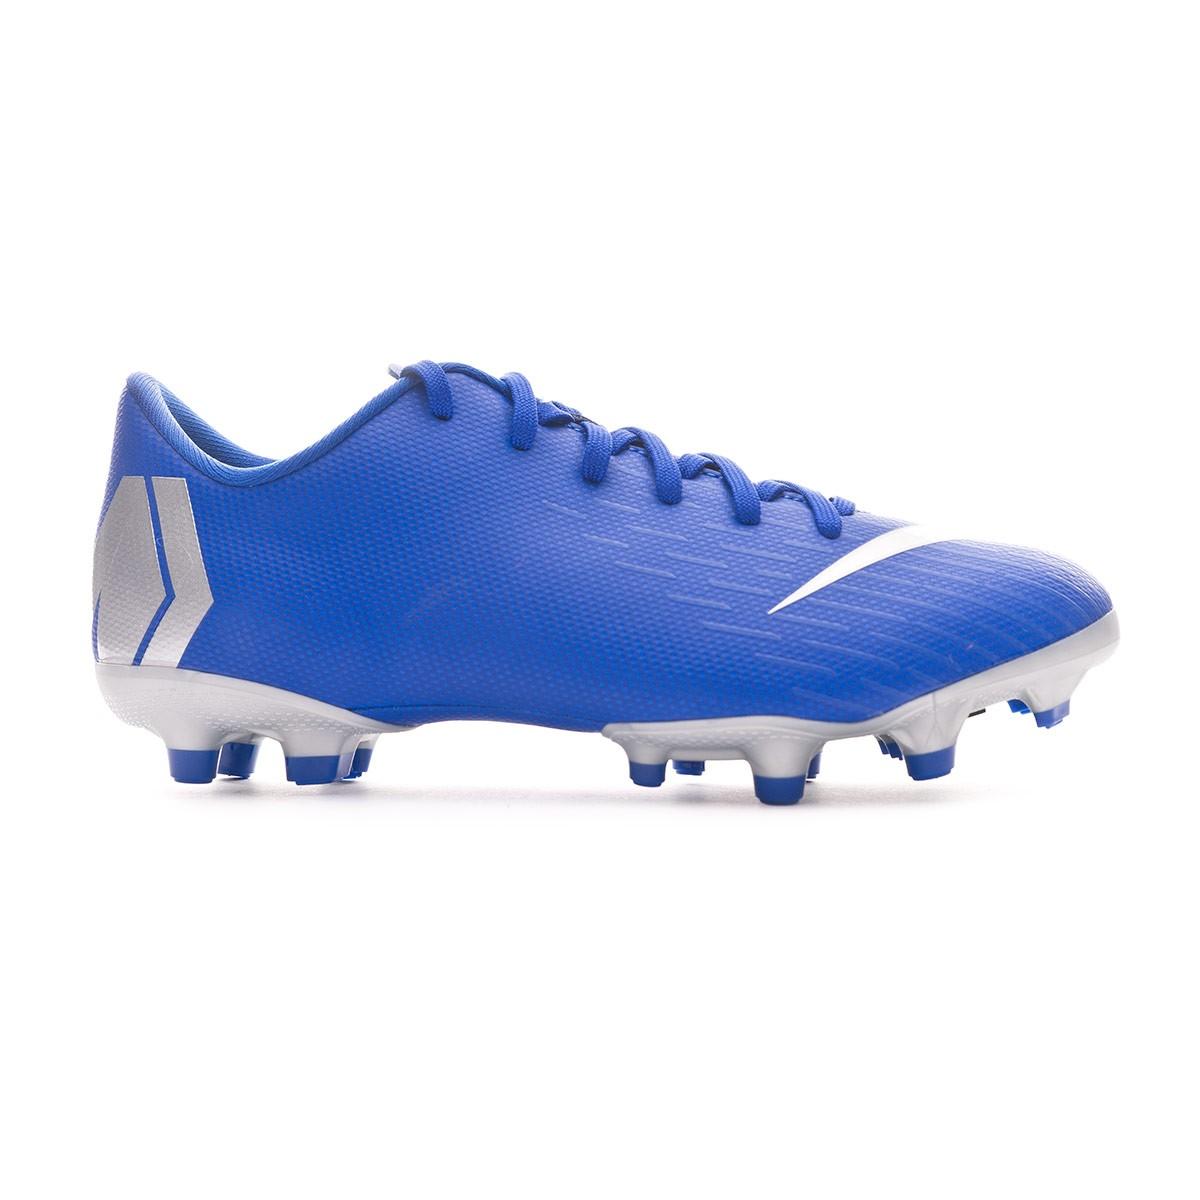 90ca2320611 Football Boots Nike Kids Mercurial Vapor XII Academy MG Racer blue-Metallic  silver-Black-Volt - Tienda de fútbol Fútbol Emotion